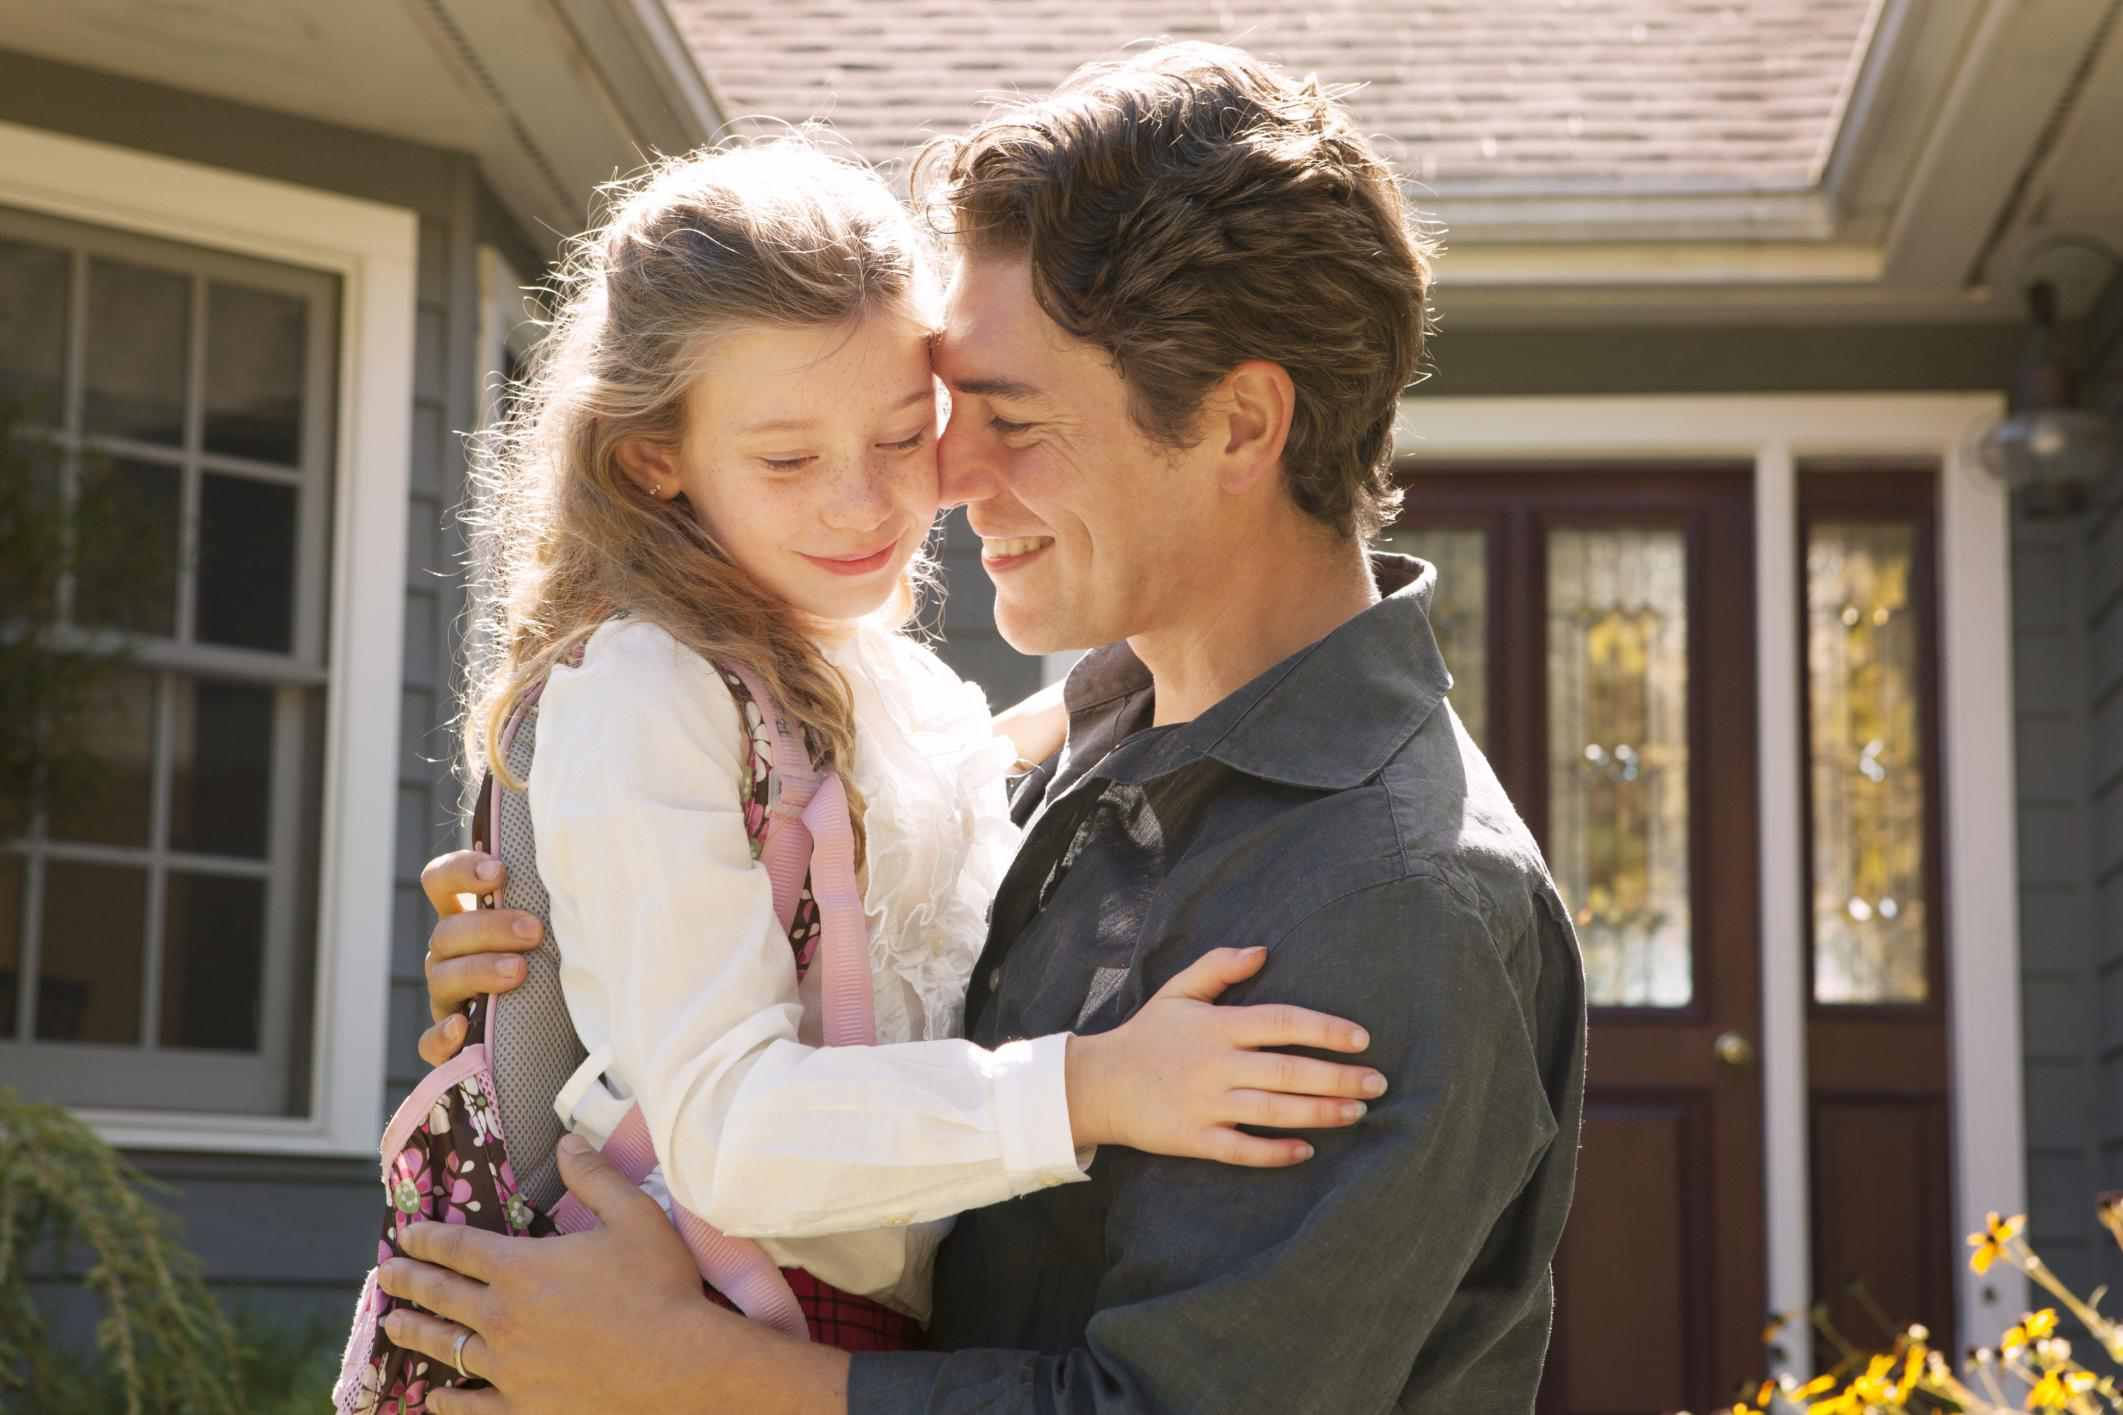 8 Discipline Strategies for Parenting a Sensitive Child